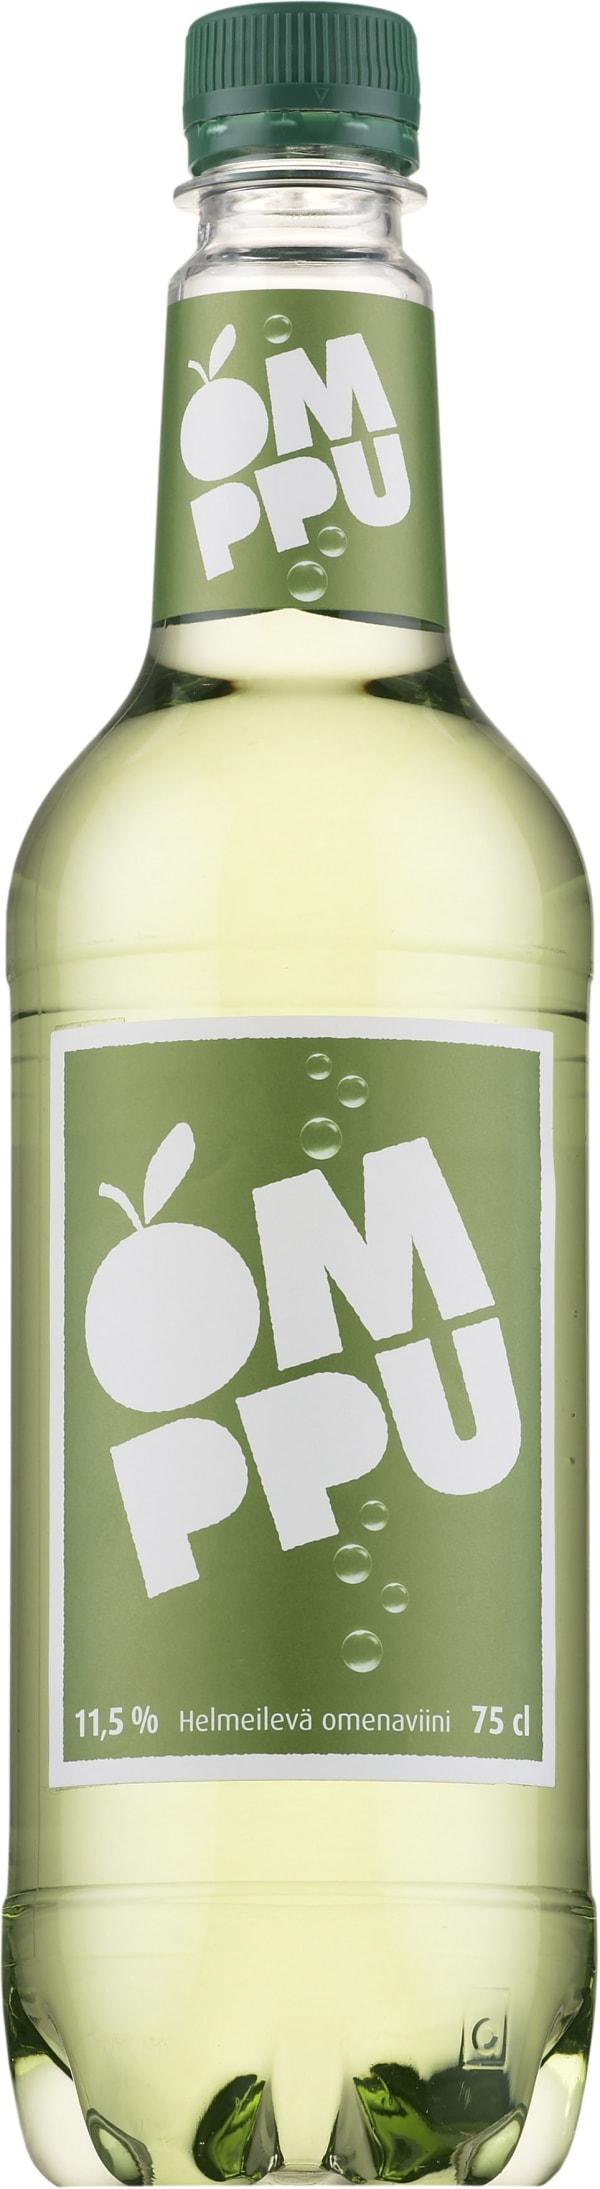 Omppu Helmeilevä Omenaviini  muovipullo